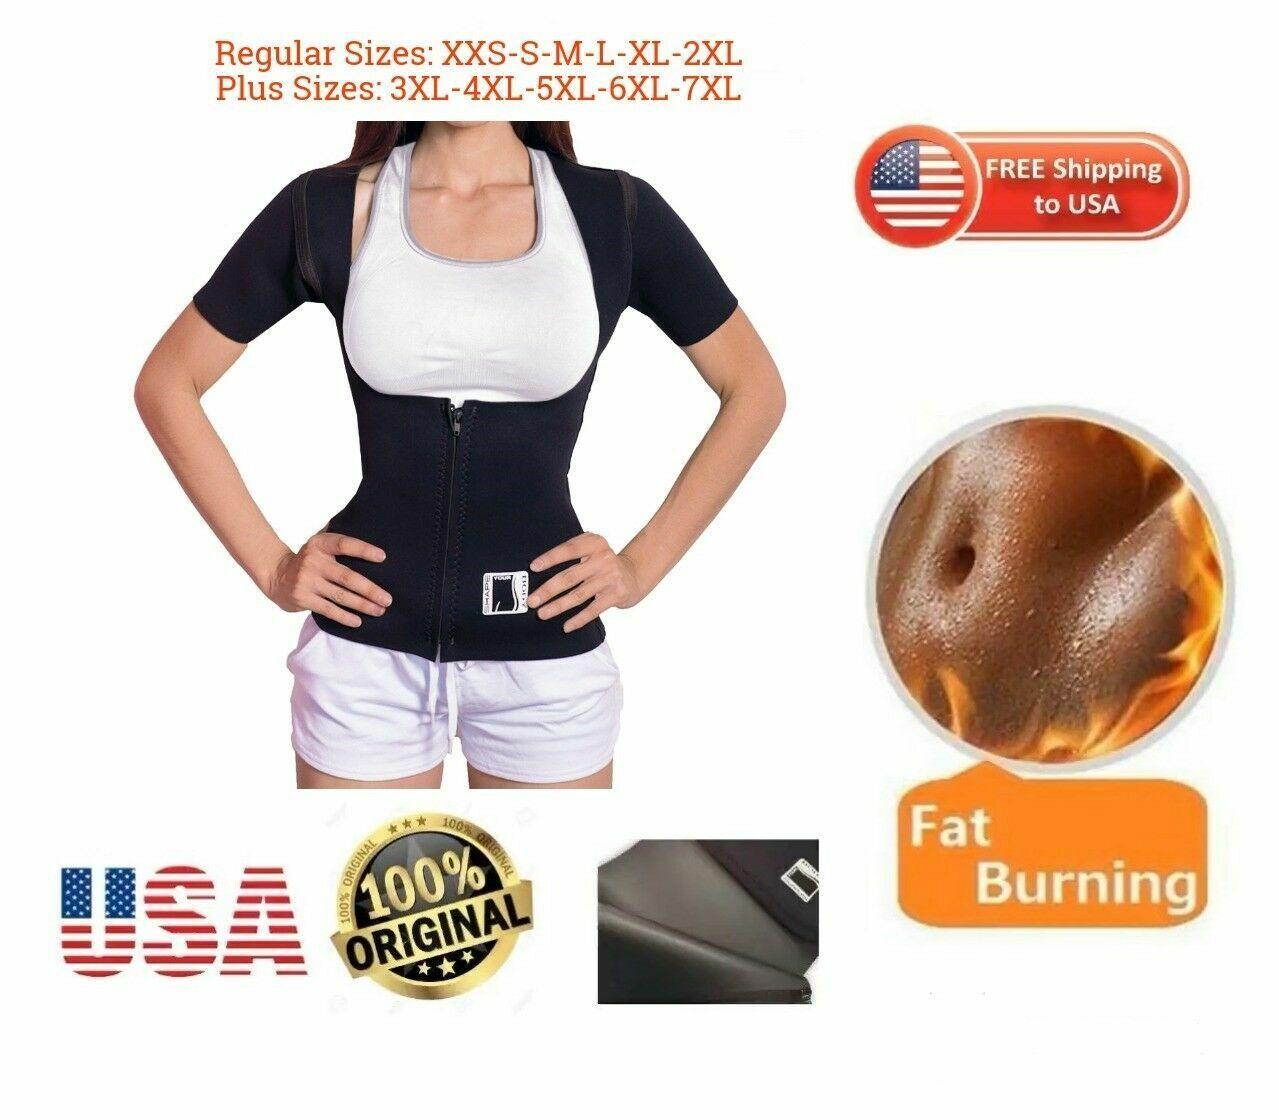 Woman USA Neoprene Body Sharpe Slimming Waist Belt Yoga Sweat Burner Hot Vest